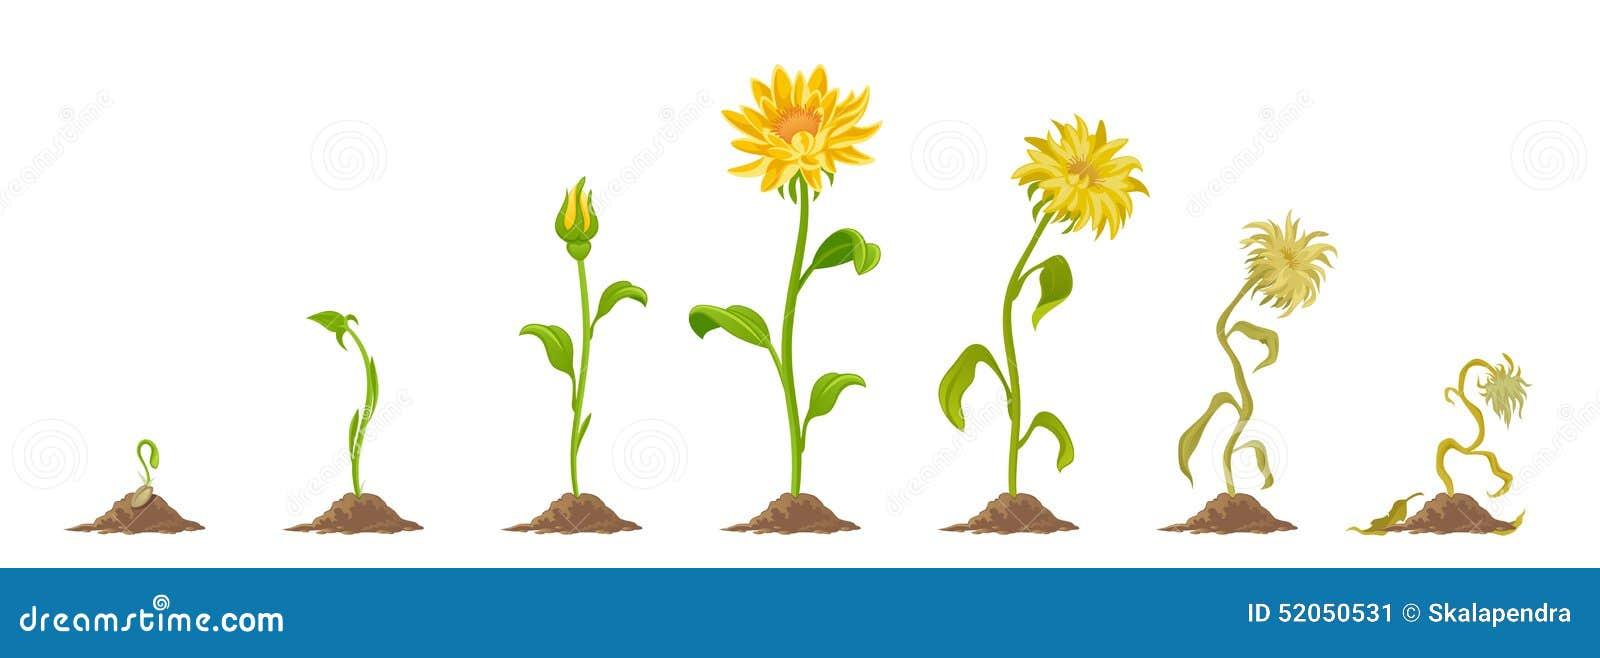 a bee on sunflower clip art